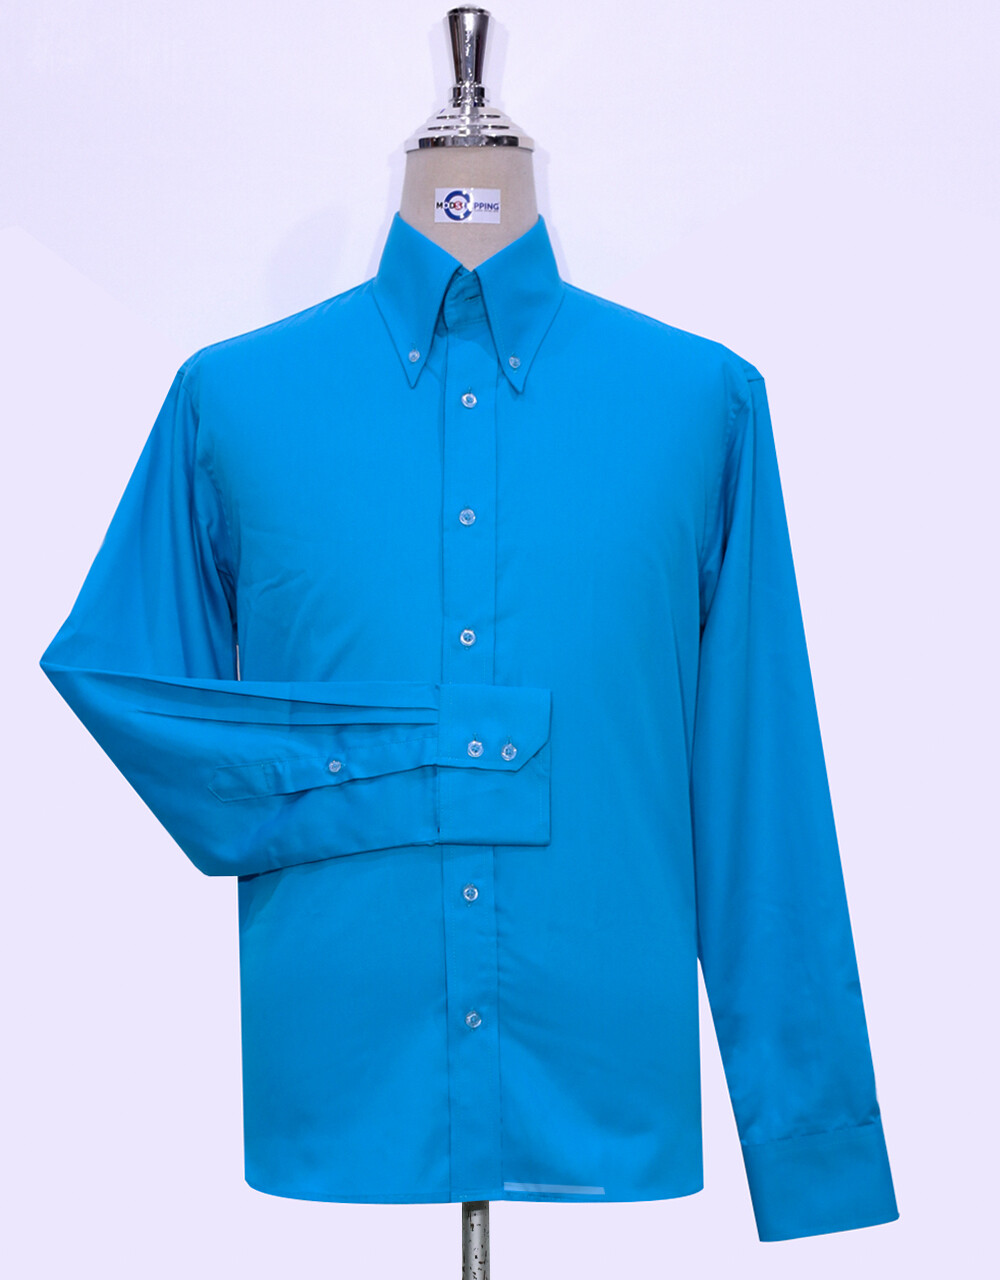 Button-Down Collar Shirt | Deep Sky Blue Color Shirt